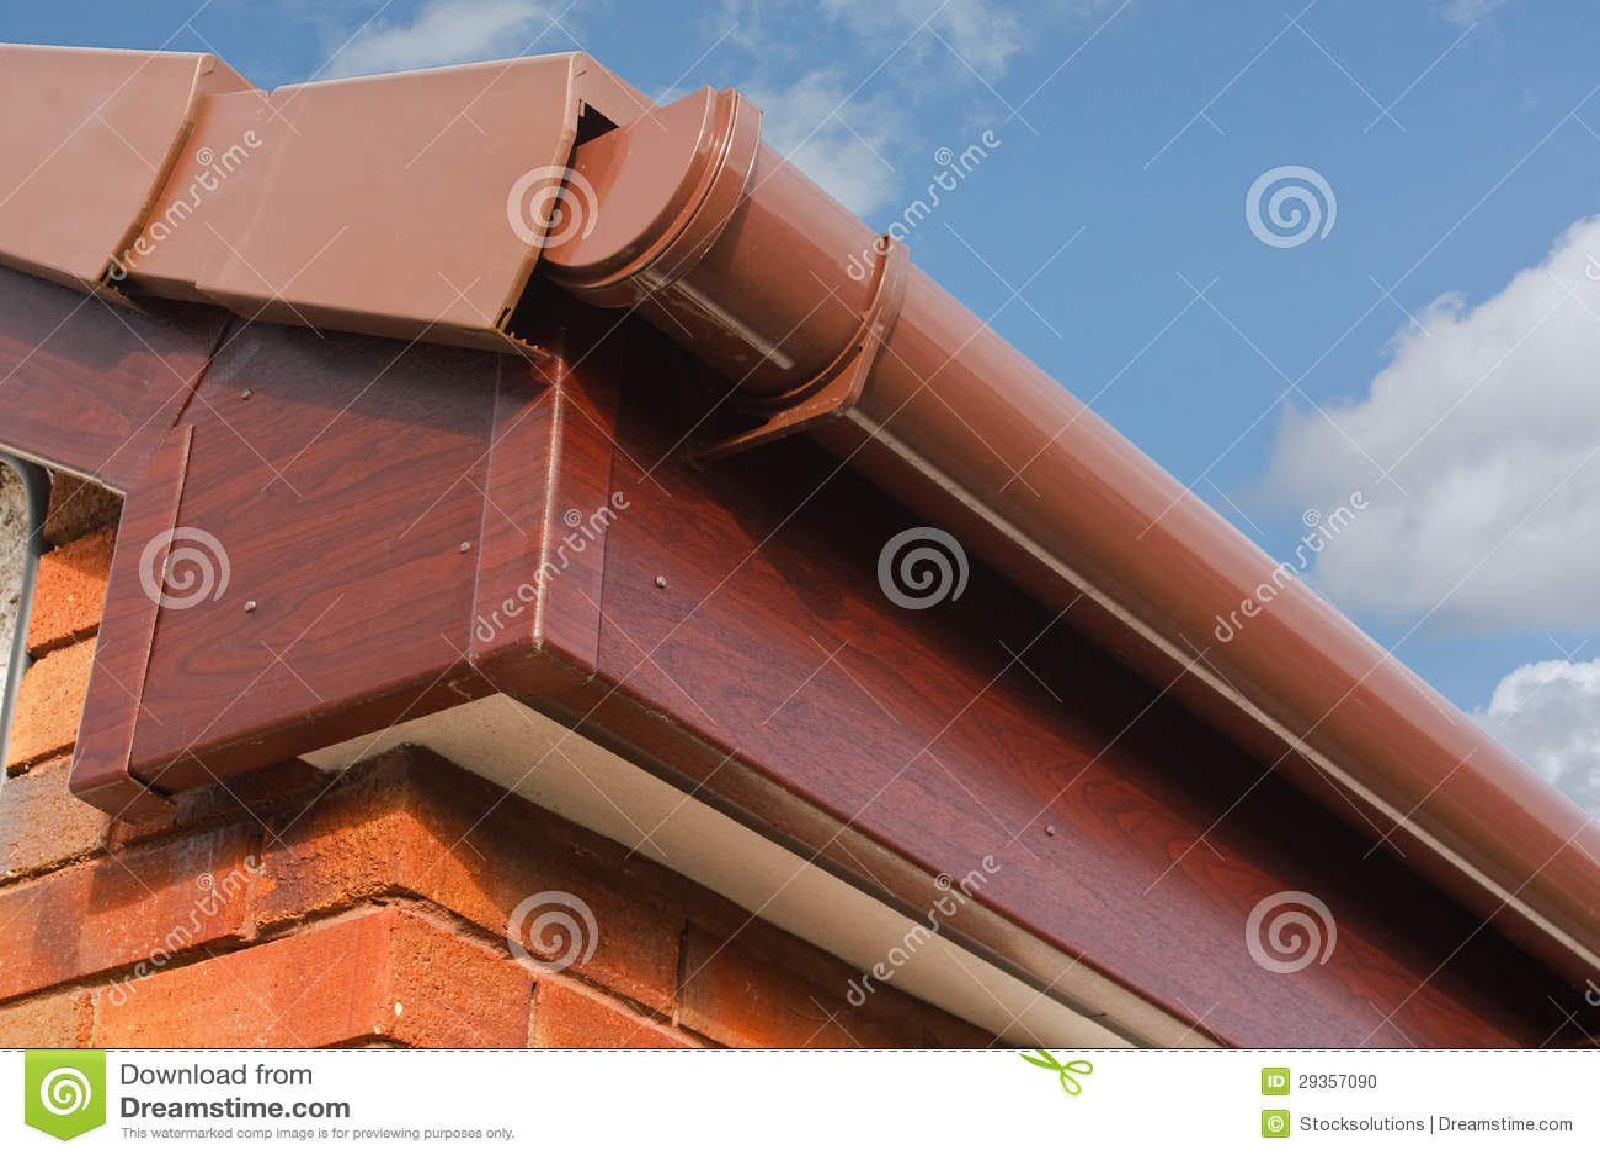 Roofline PVCU Soffit fascia board